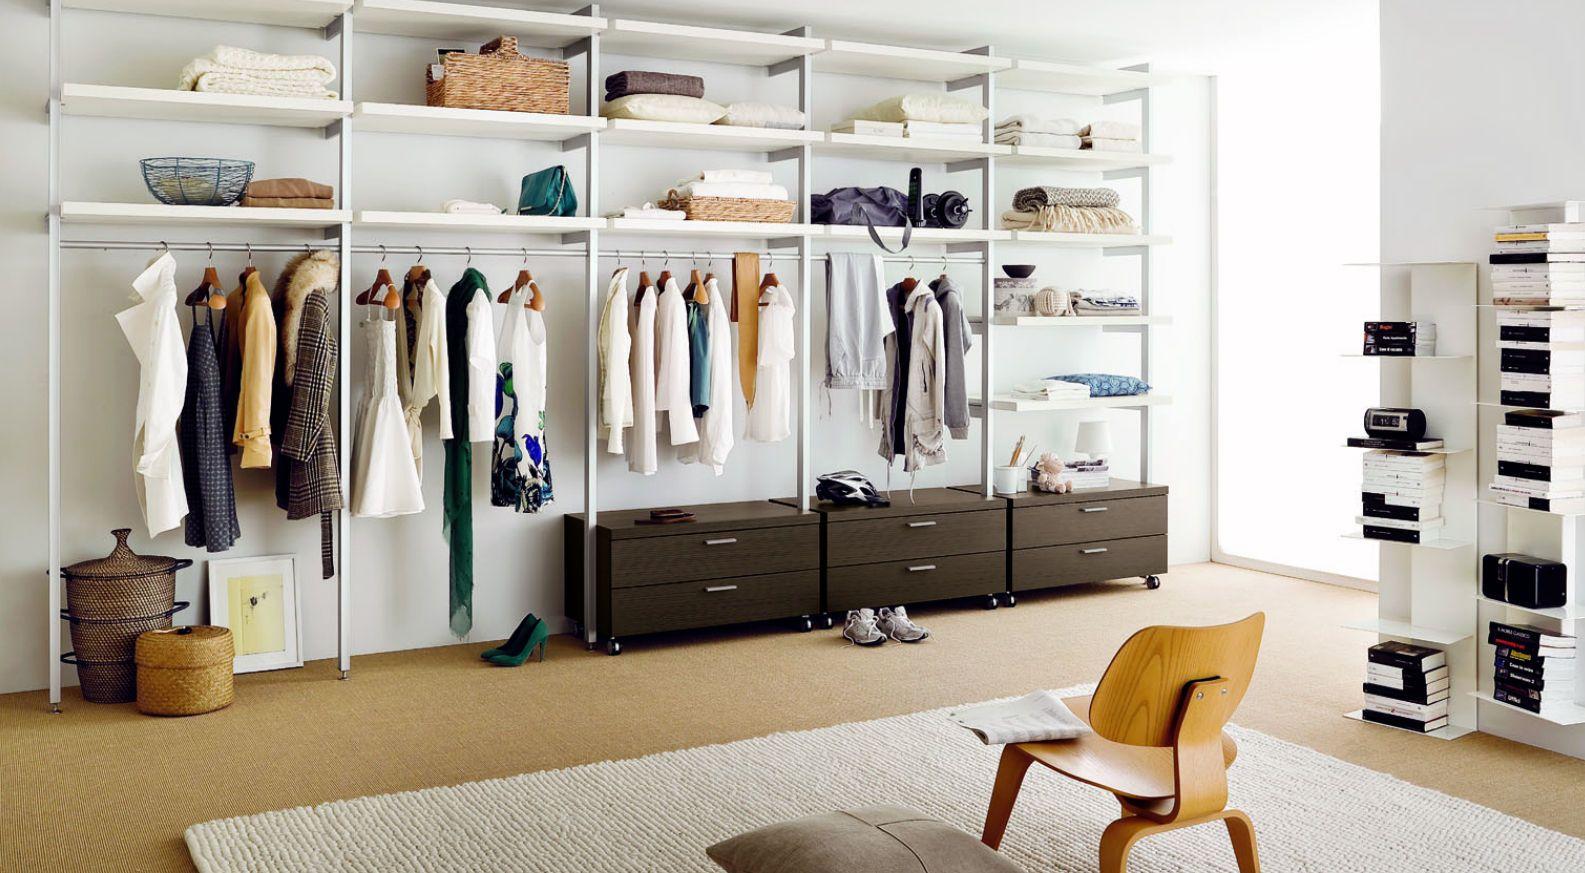 Begehbarer kleiderschrank ikea algot  Begehbarer Kleiderschrank - KLOSET K01 - md house | begehbarer ...